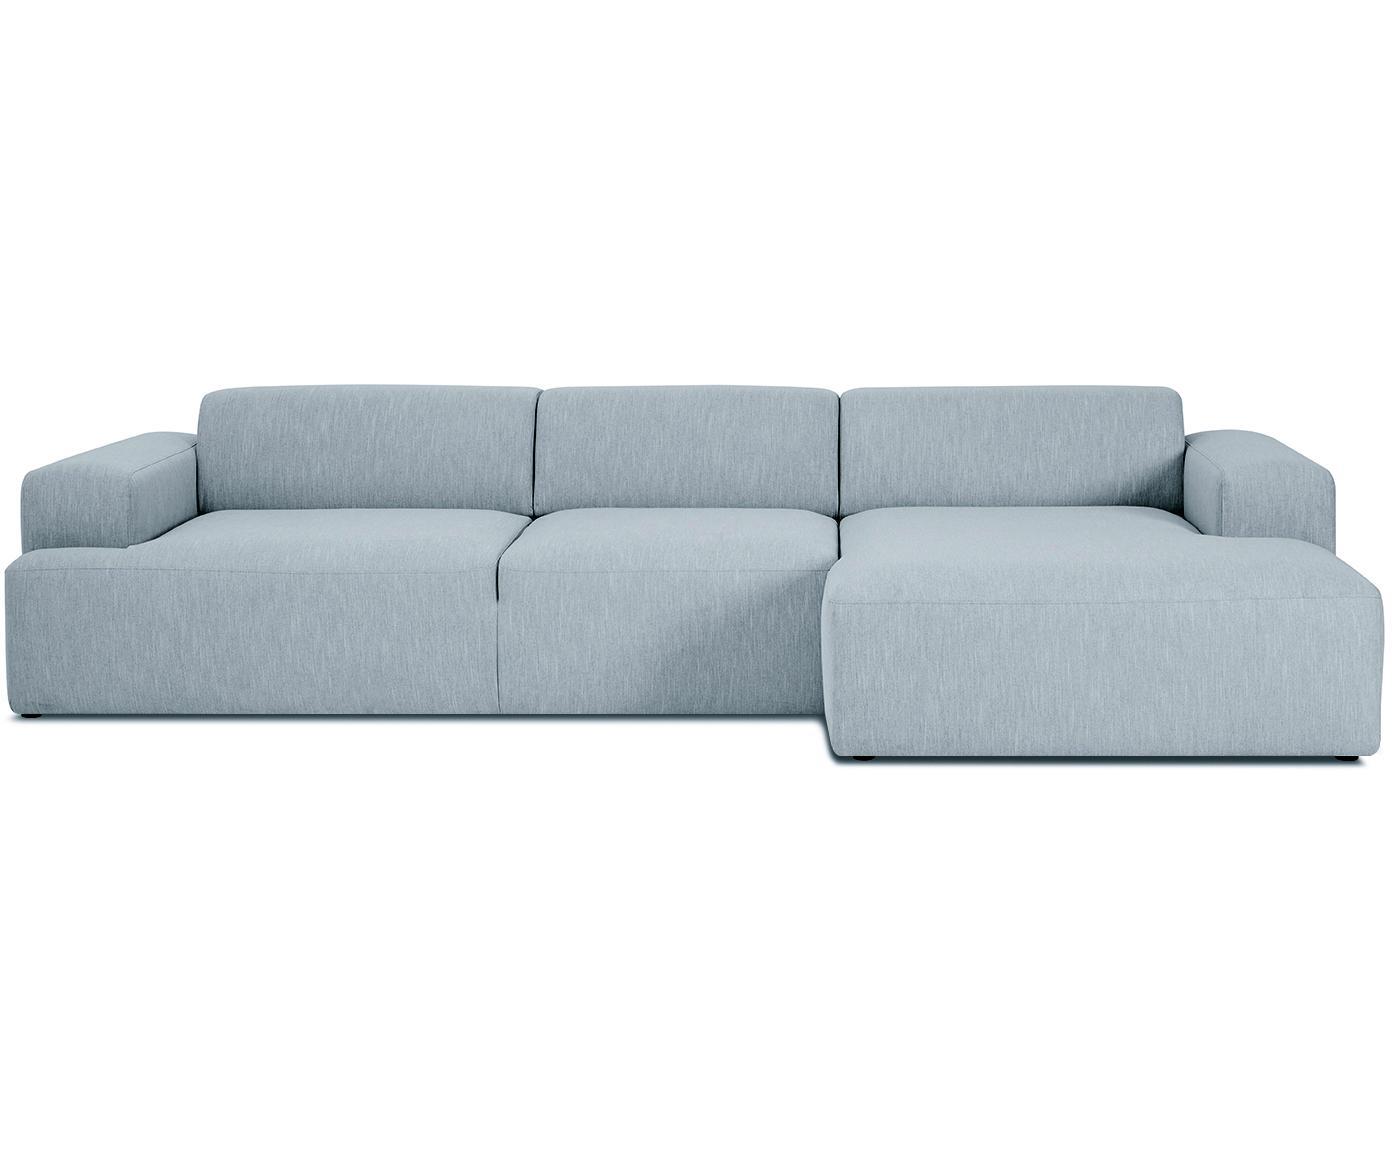 Ecksofa Melva (4-Sitzer), Bezug: Polyester 35.000 Scheuert, Gestell: Massives Kiefernholz, Spa, Webstoff Blaugrau, B 319 x T 144 cm